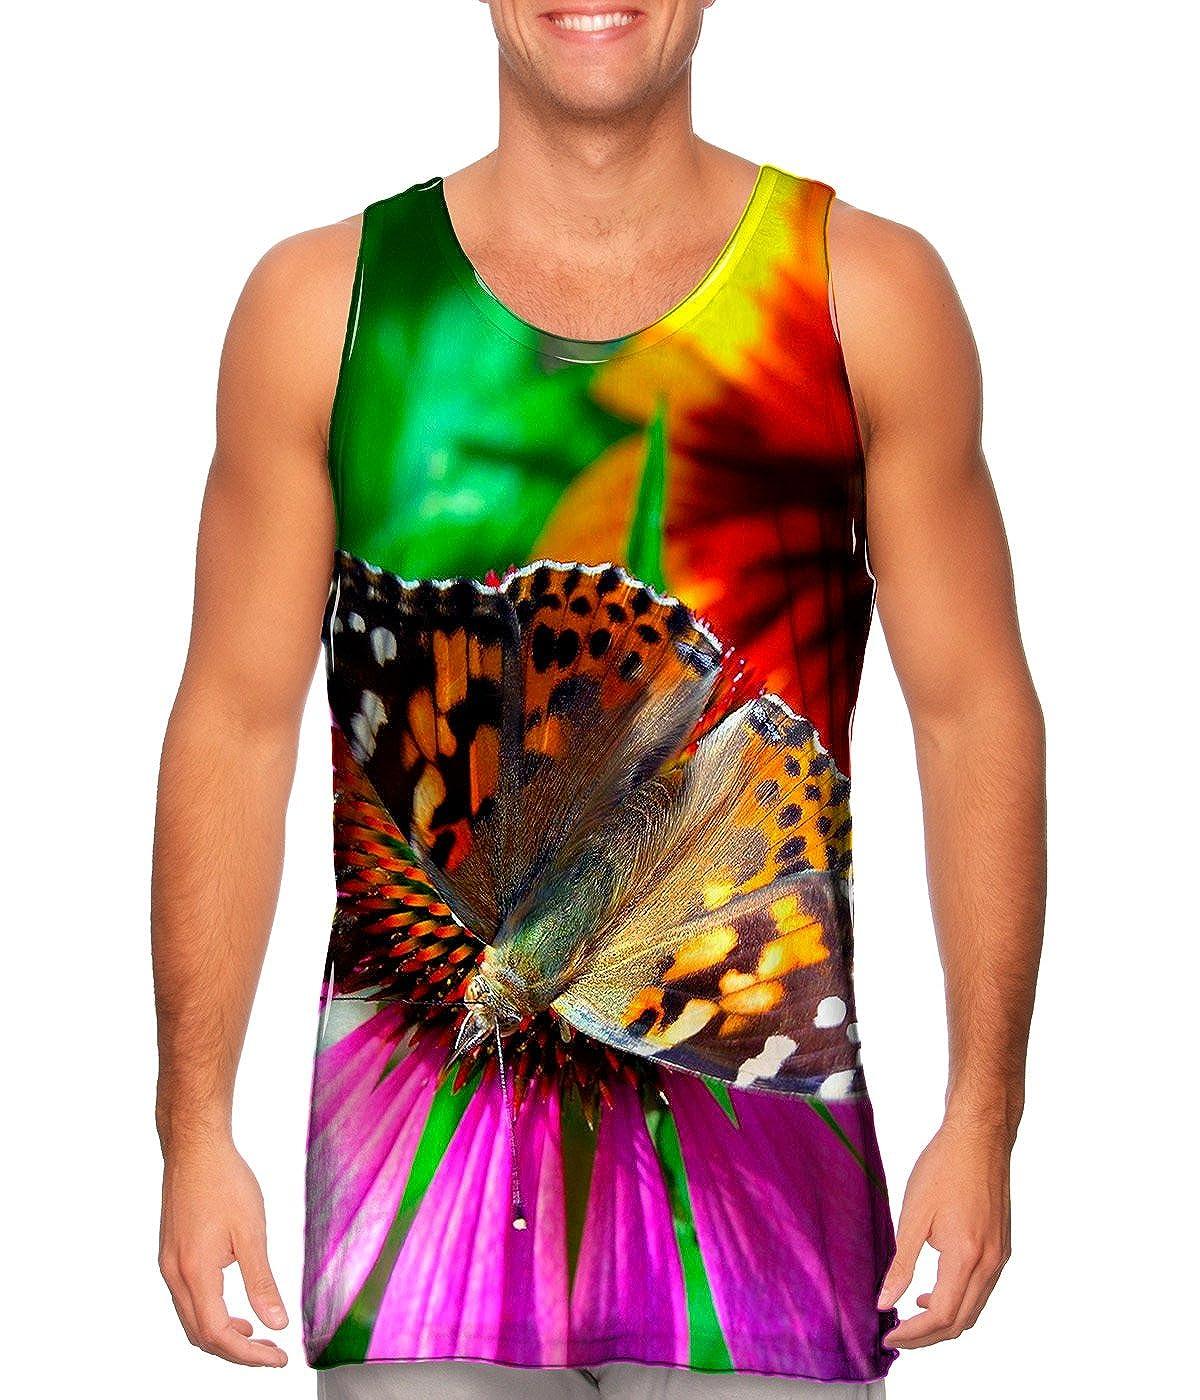 AnimalShirtsUSA TShirt Bubble Butterfly Mens Tank Top